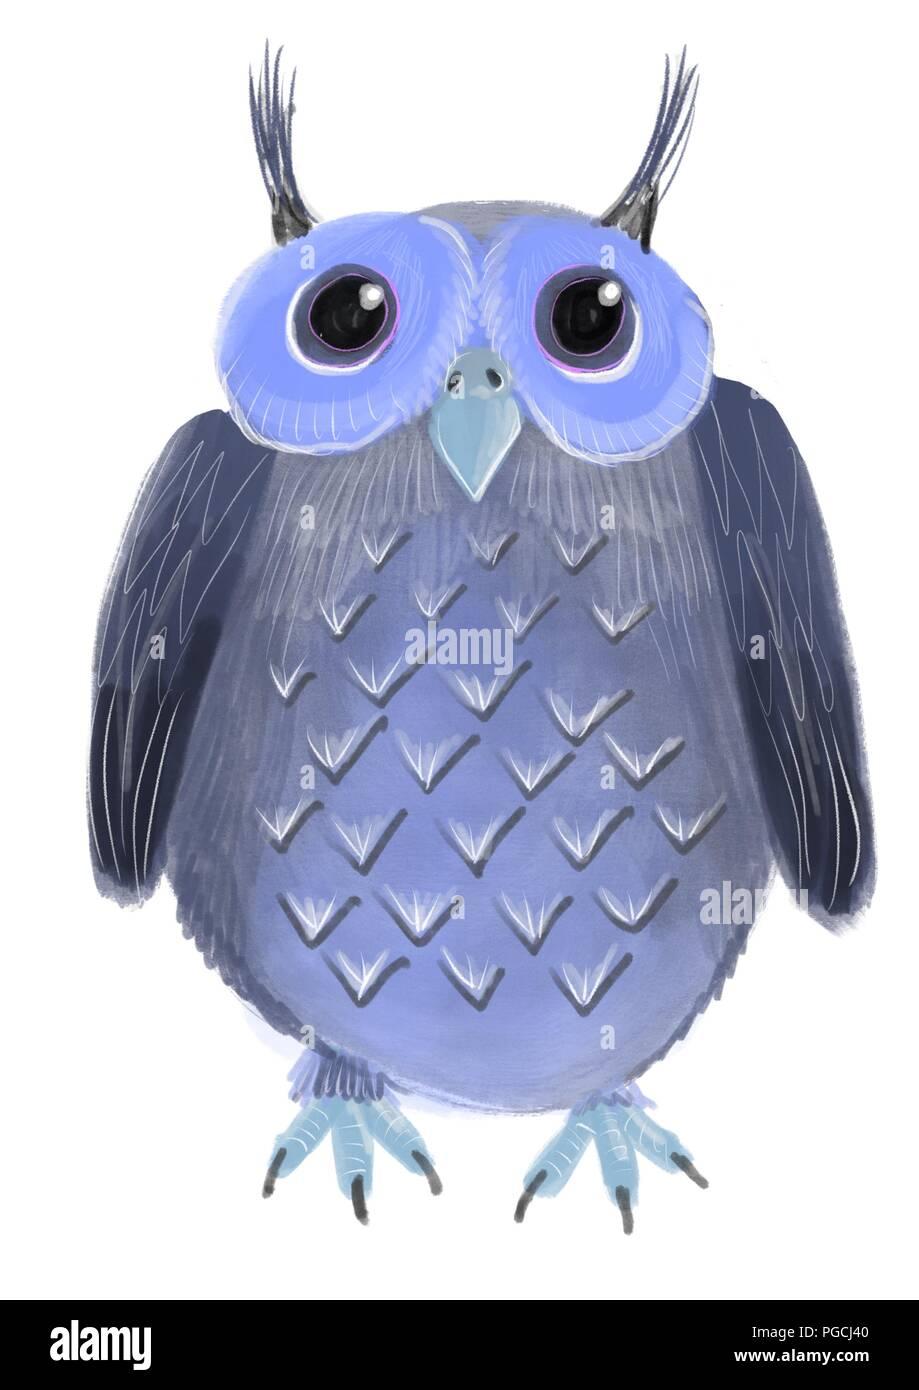 illustration of a cartoon owl - Stock Image